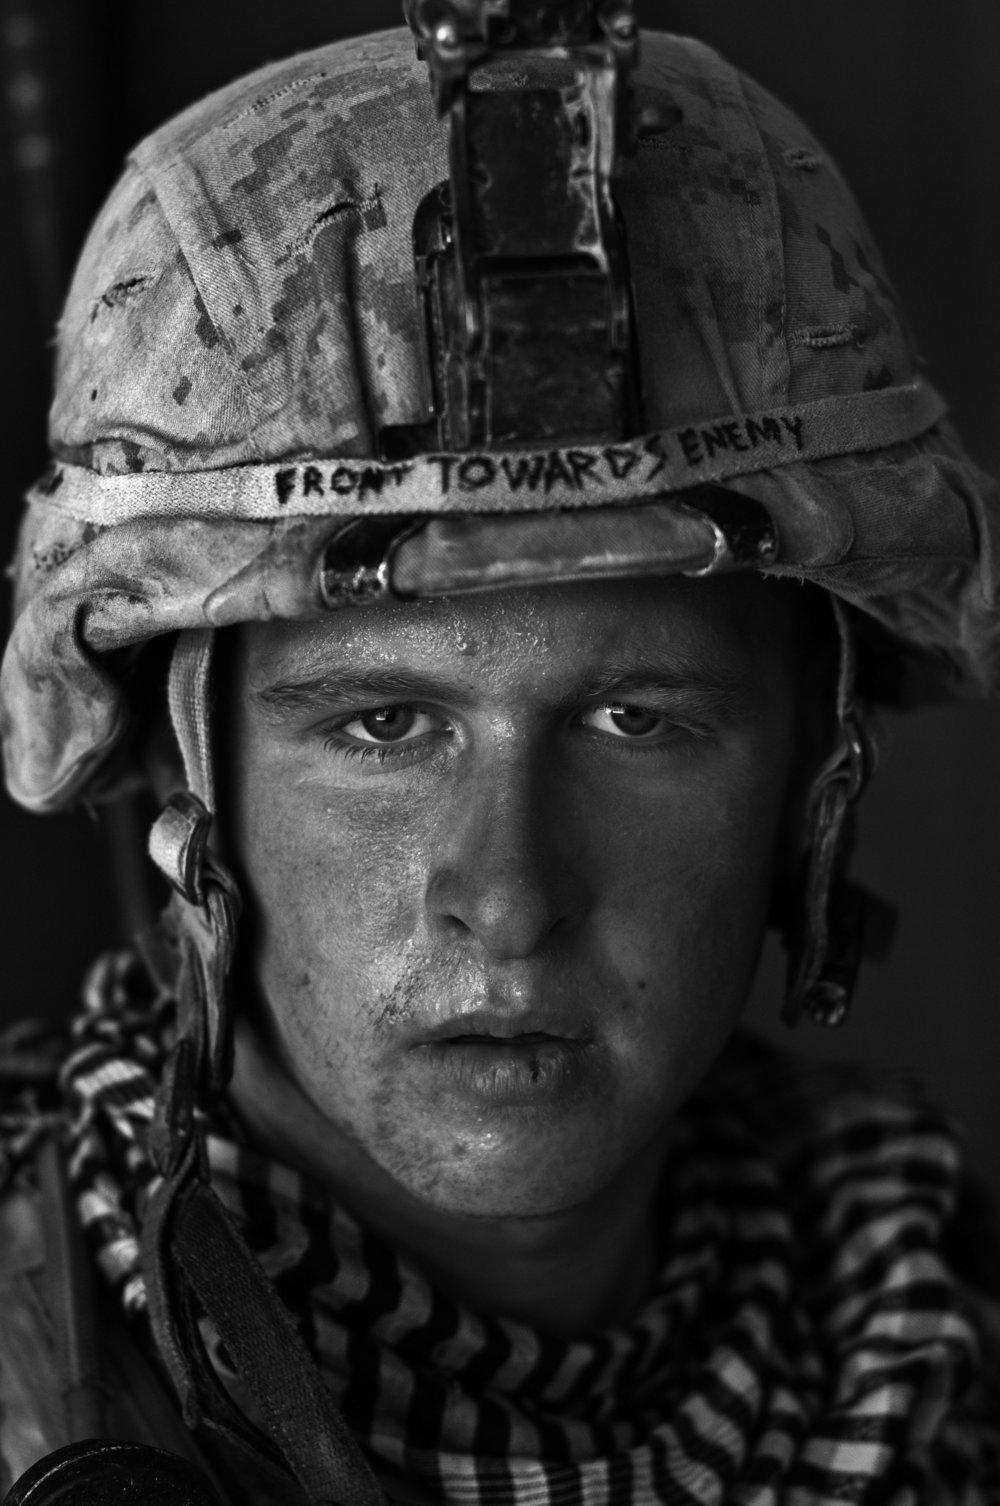 1-U.S. Marine Lcpl. Damon Connell